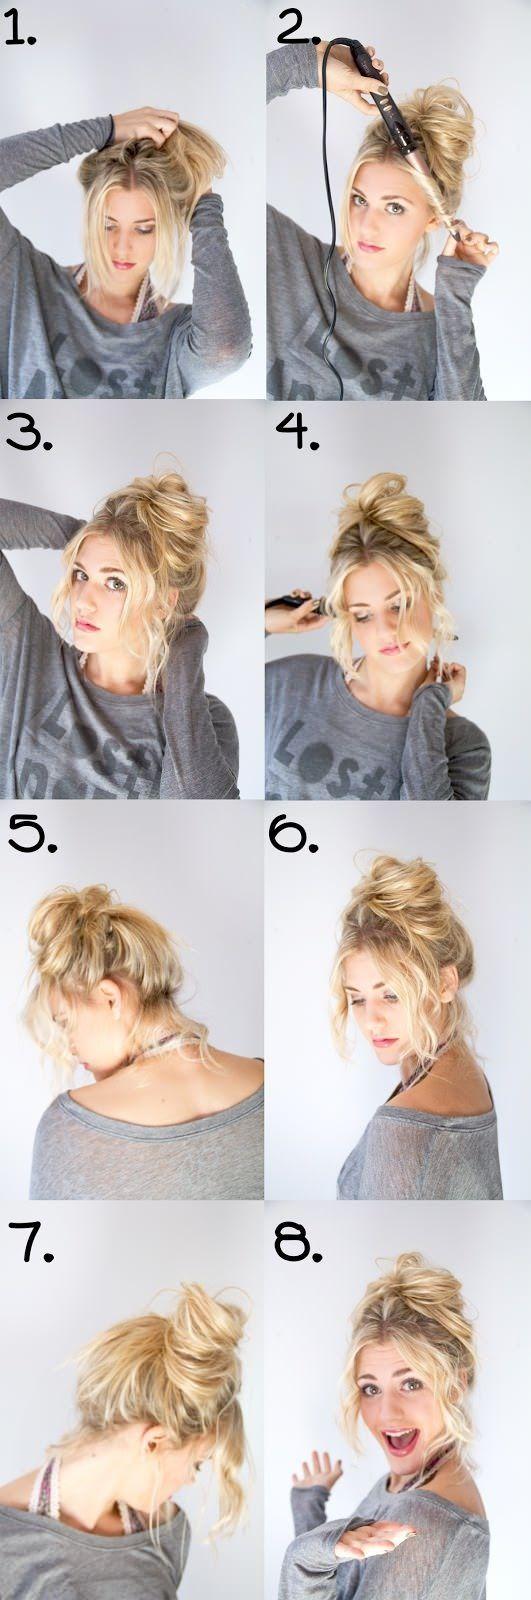 Nice simple hairstyles - Simple Cute Messy Hairstyle